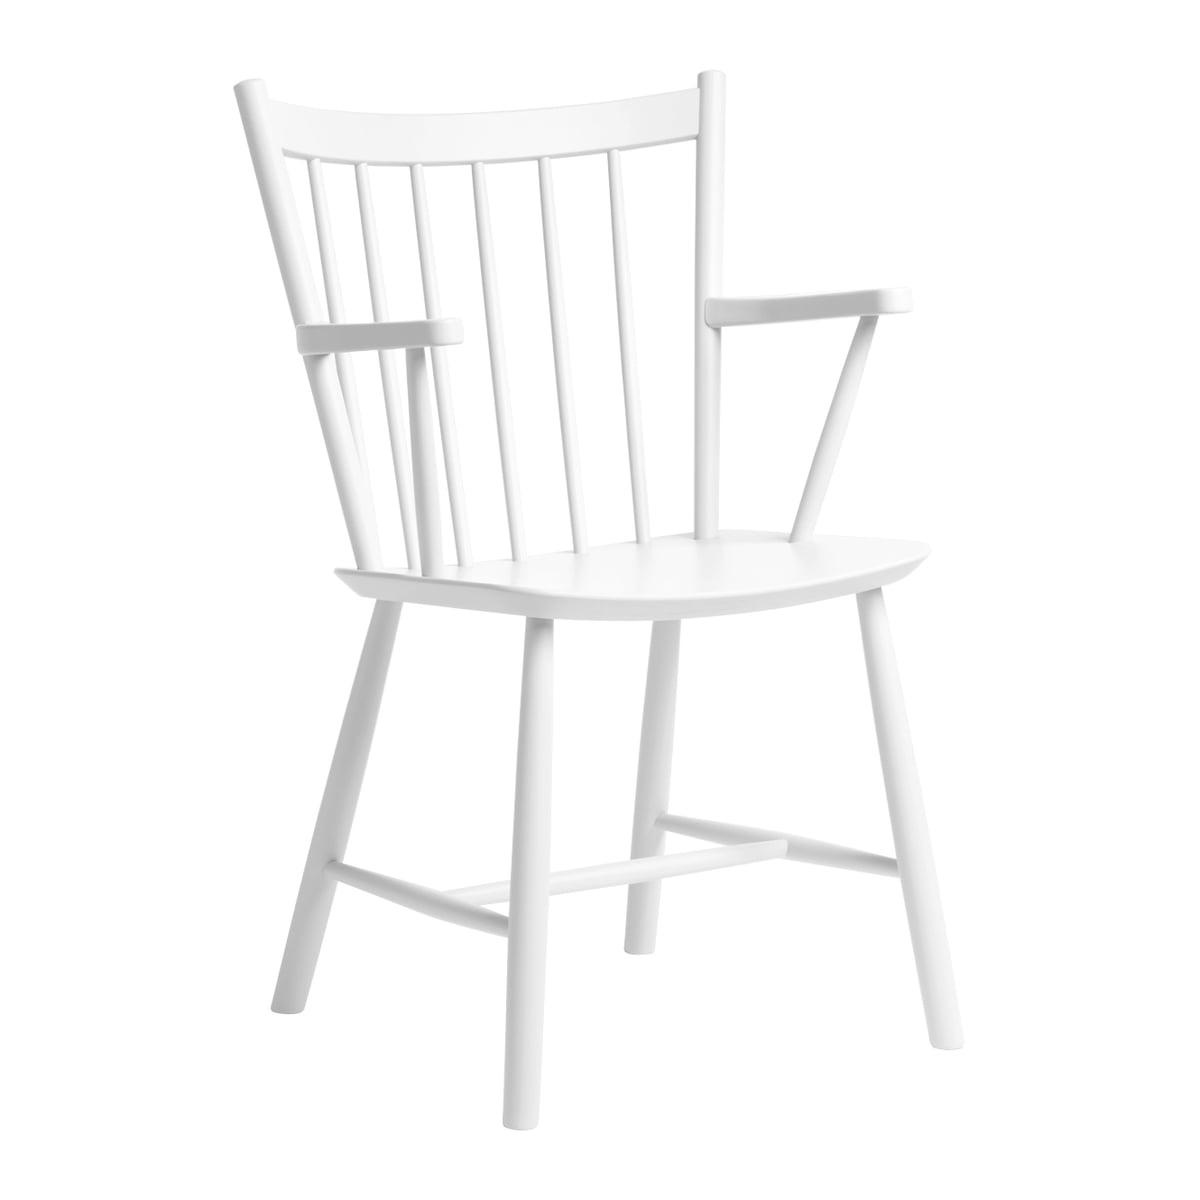 J41 Stuhl Buche Weiß lackiert Hay